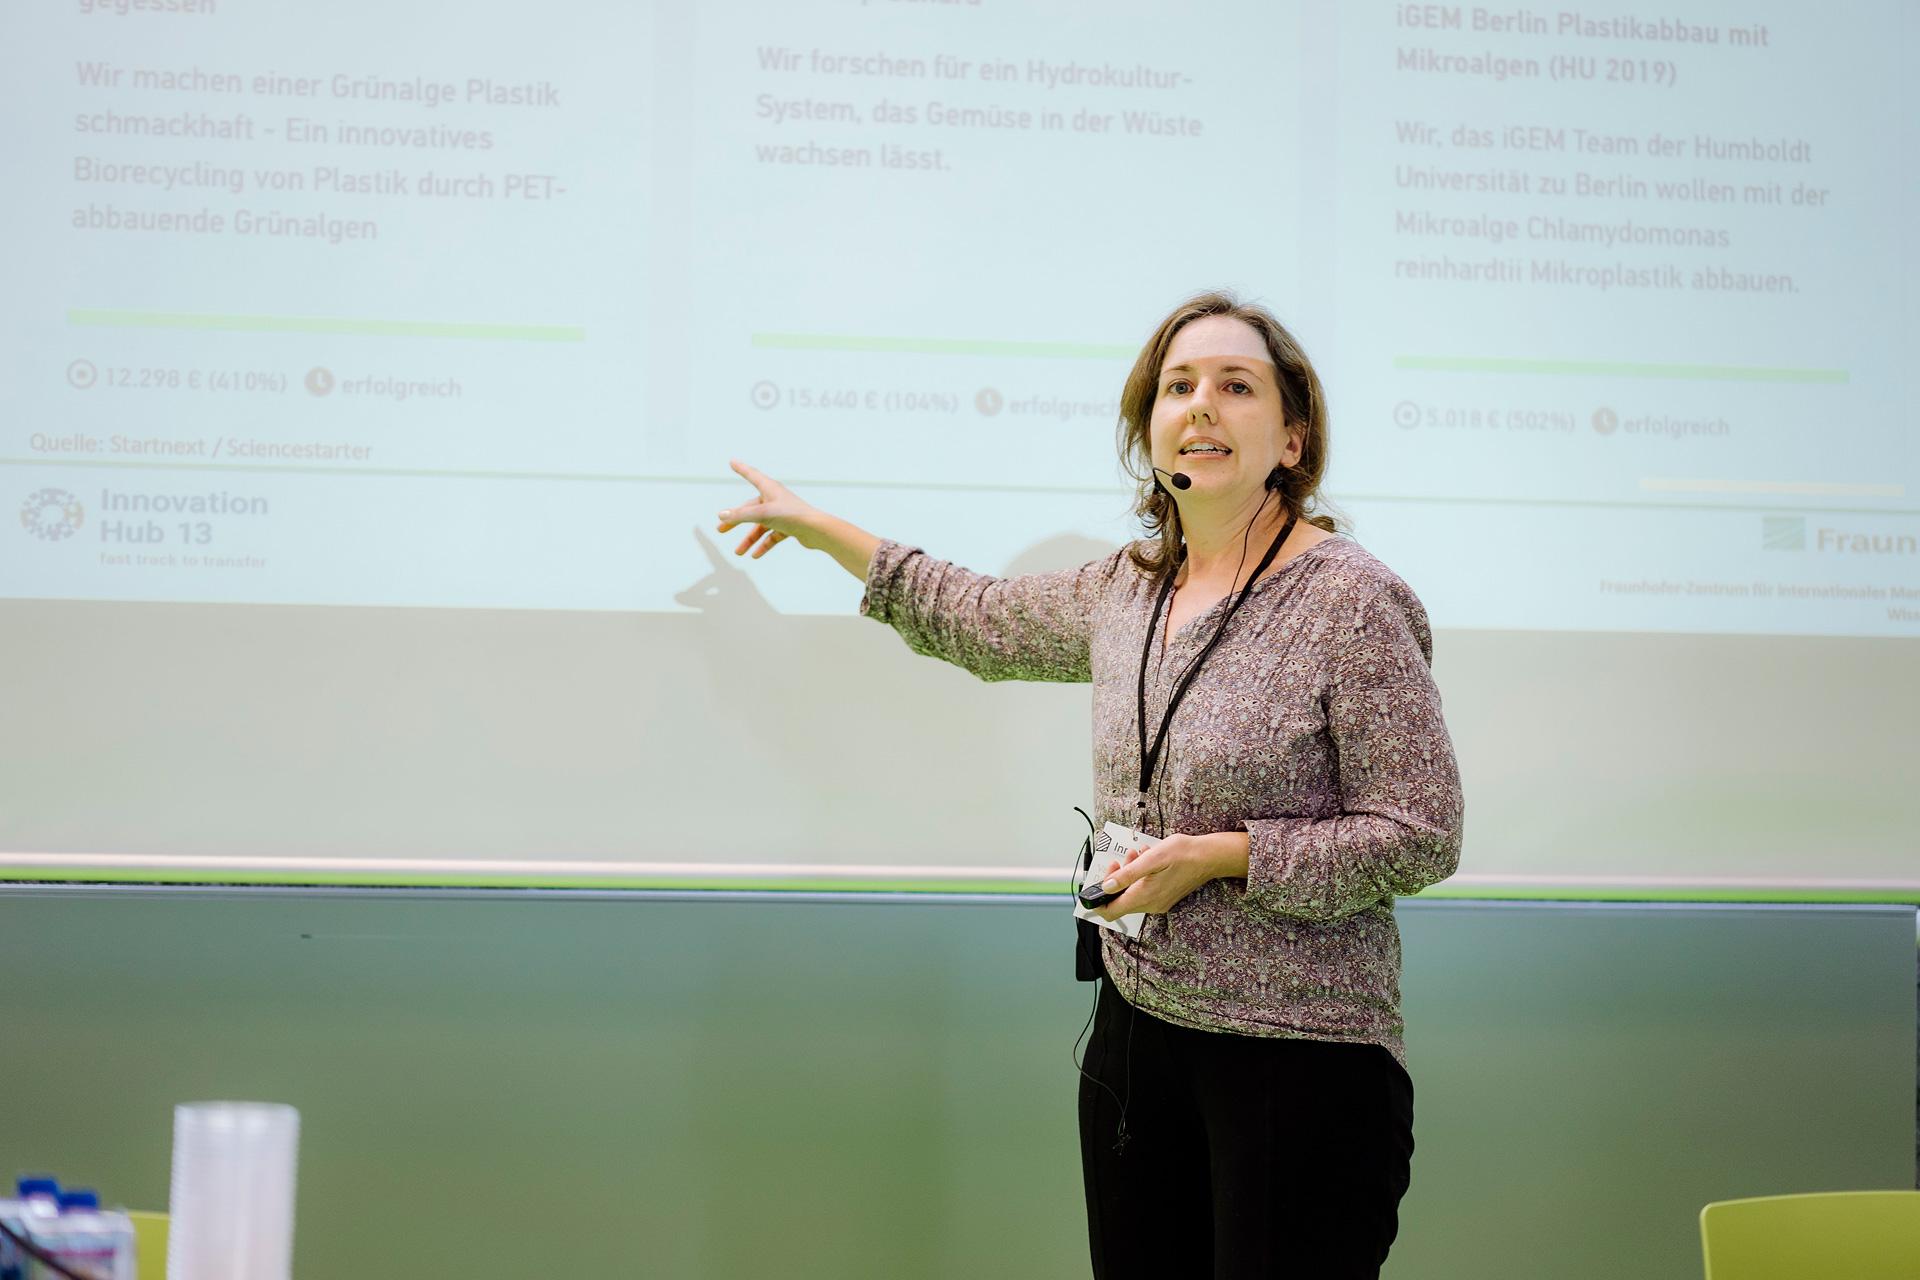 """Science Crowdfunding"" Valerie Daldrup, Fraunhofer IMW"